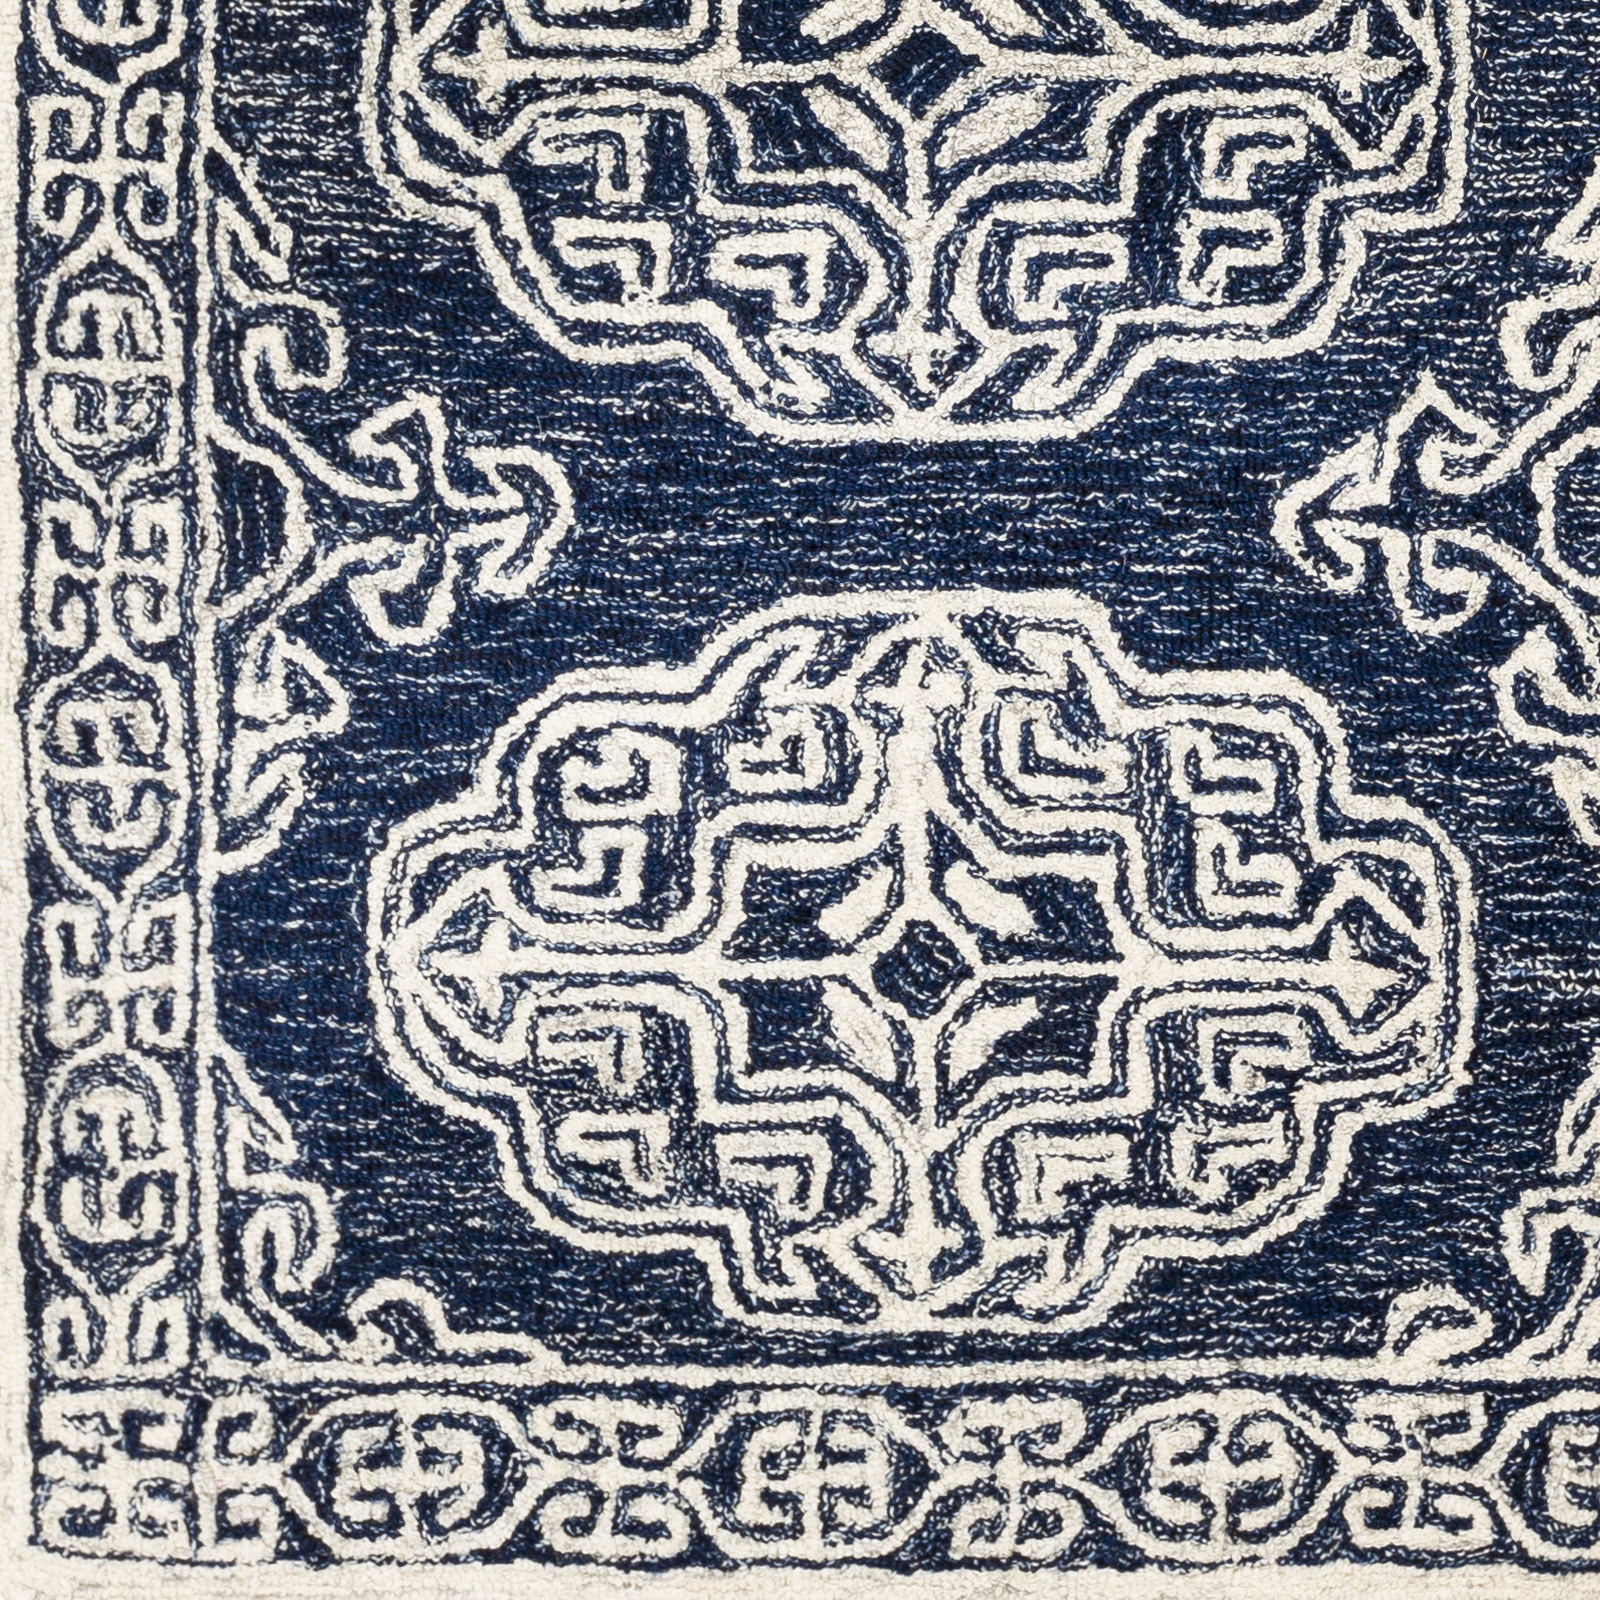 Granada - GND-2308 - 4' x 6'